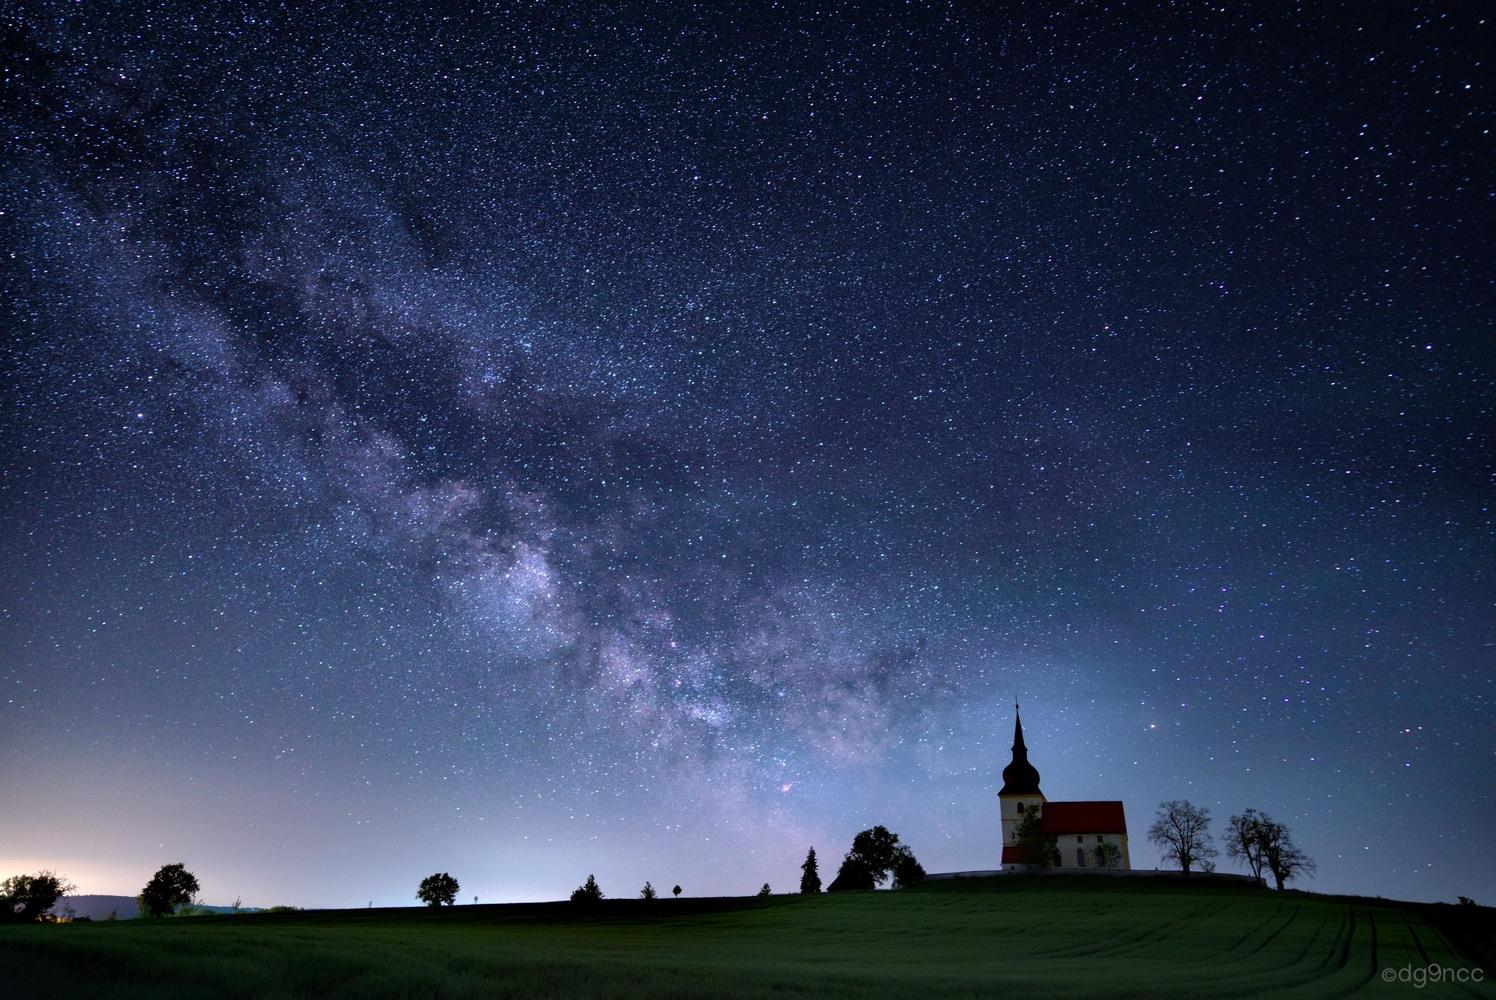 Kaubenheim Milky Way by Dg9ncc /portable